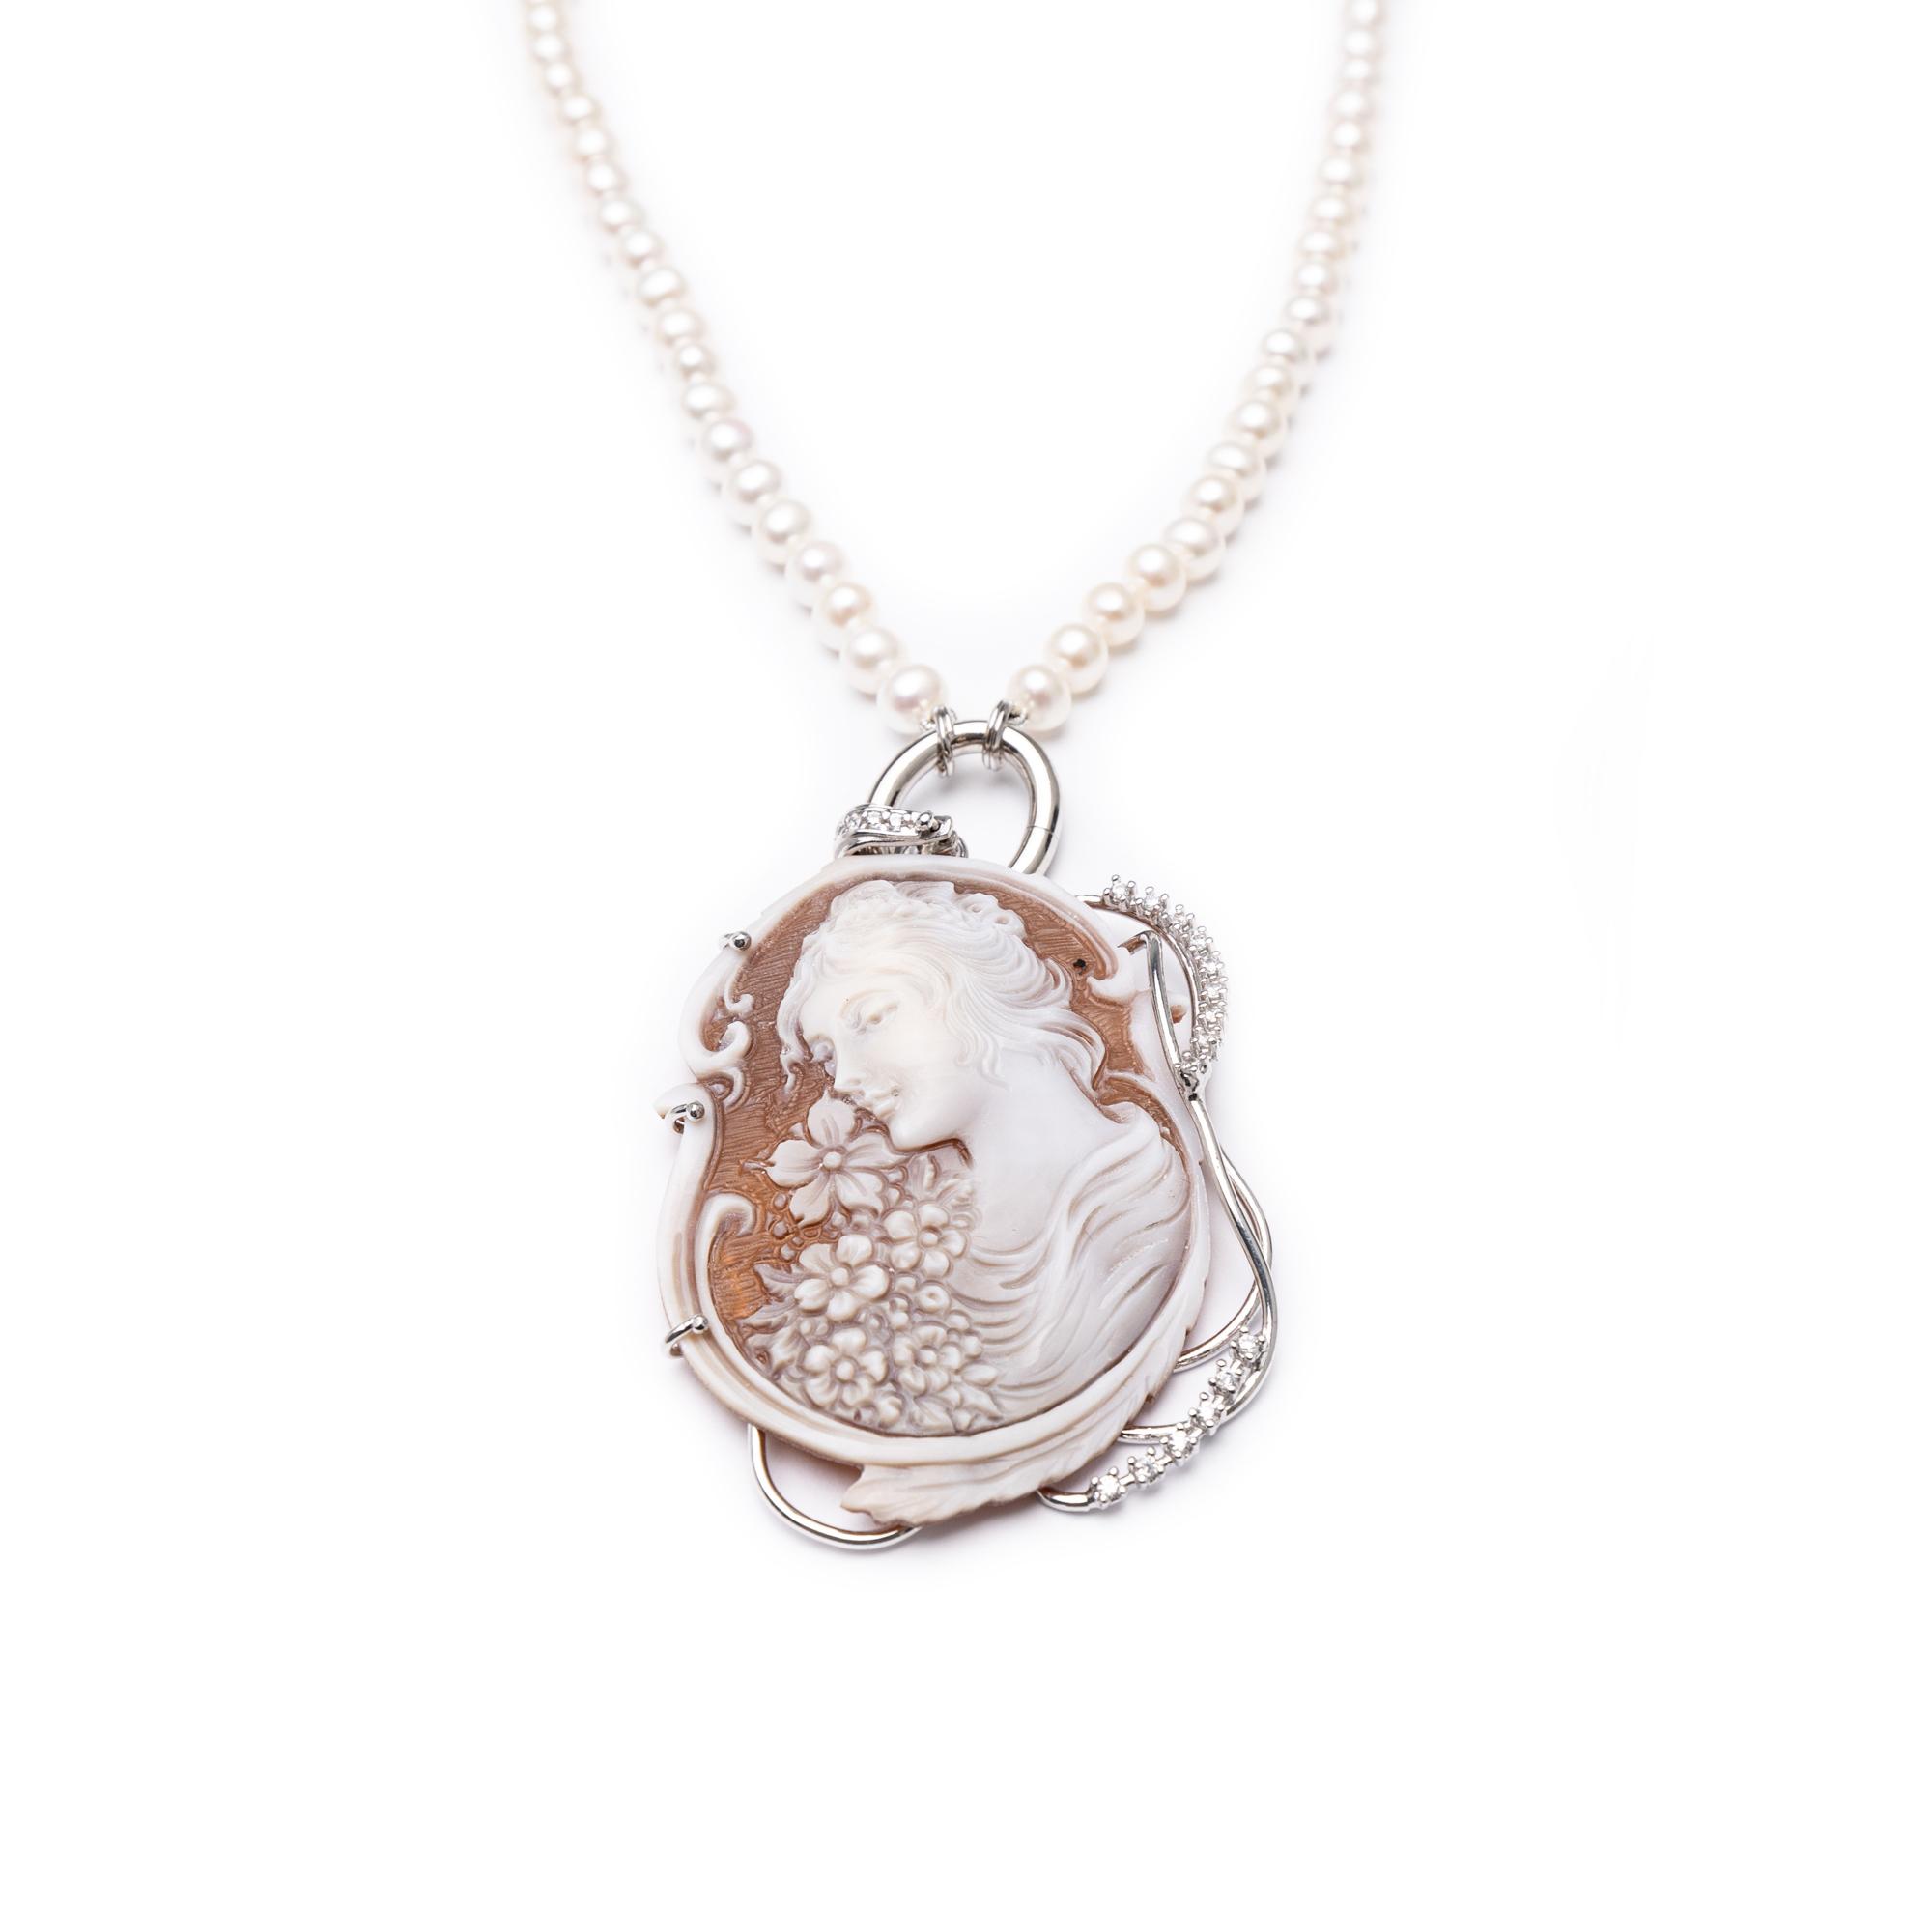 Silver 925 Cameo Necklace